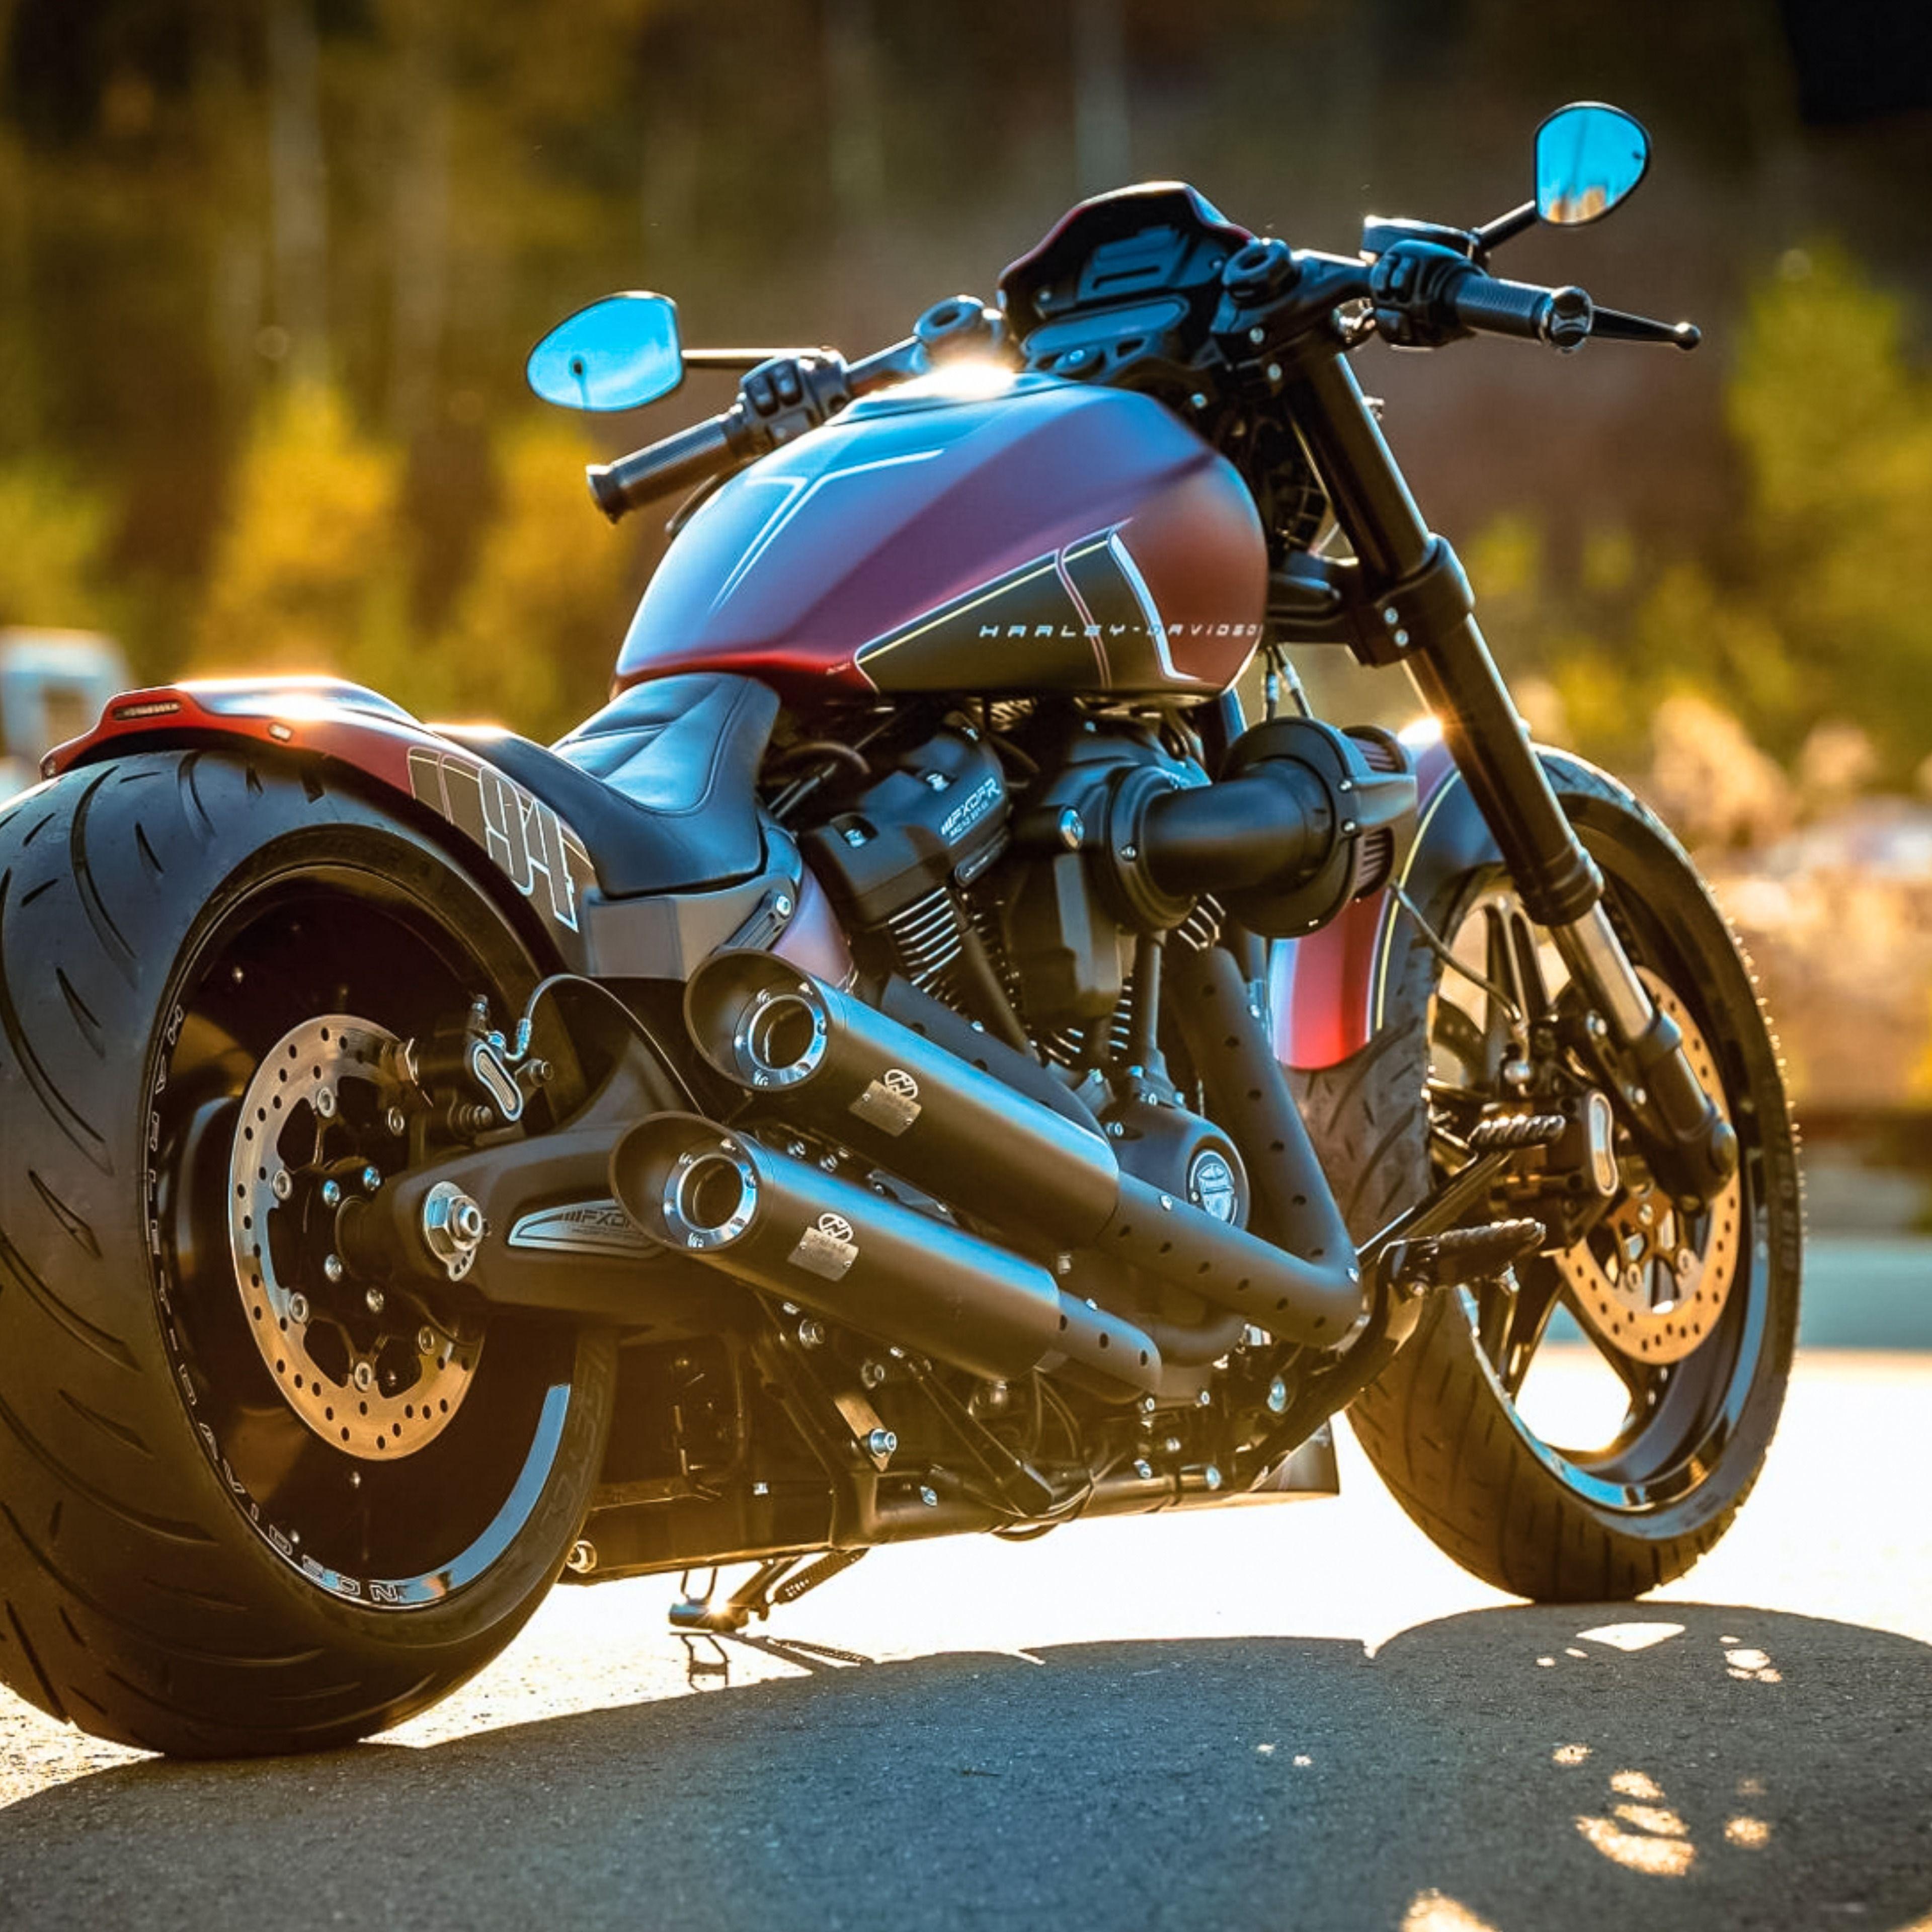 2020 Harley Davidson Fxdr Custom Red Rocket In 2021 Red Color Schemes Softail Alphabet Activities Preschool